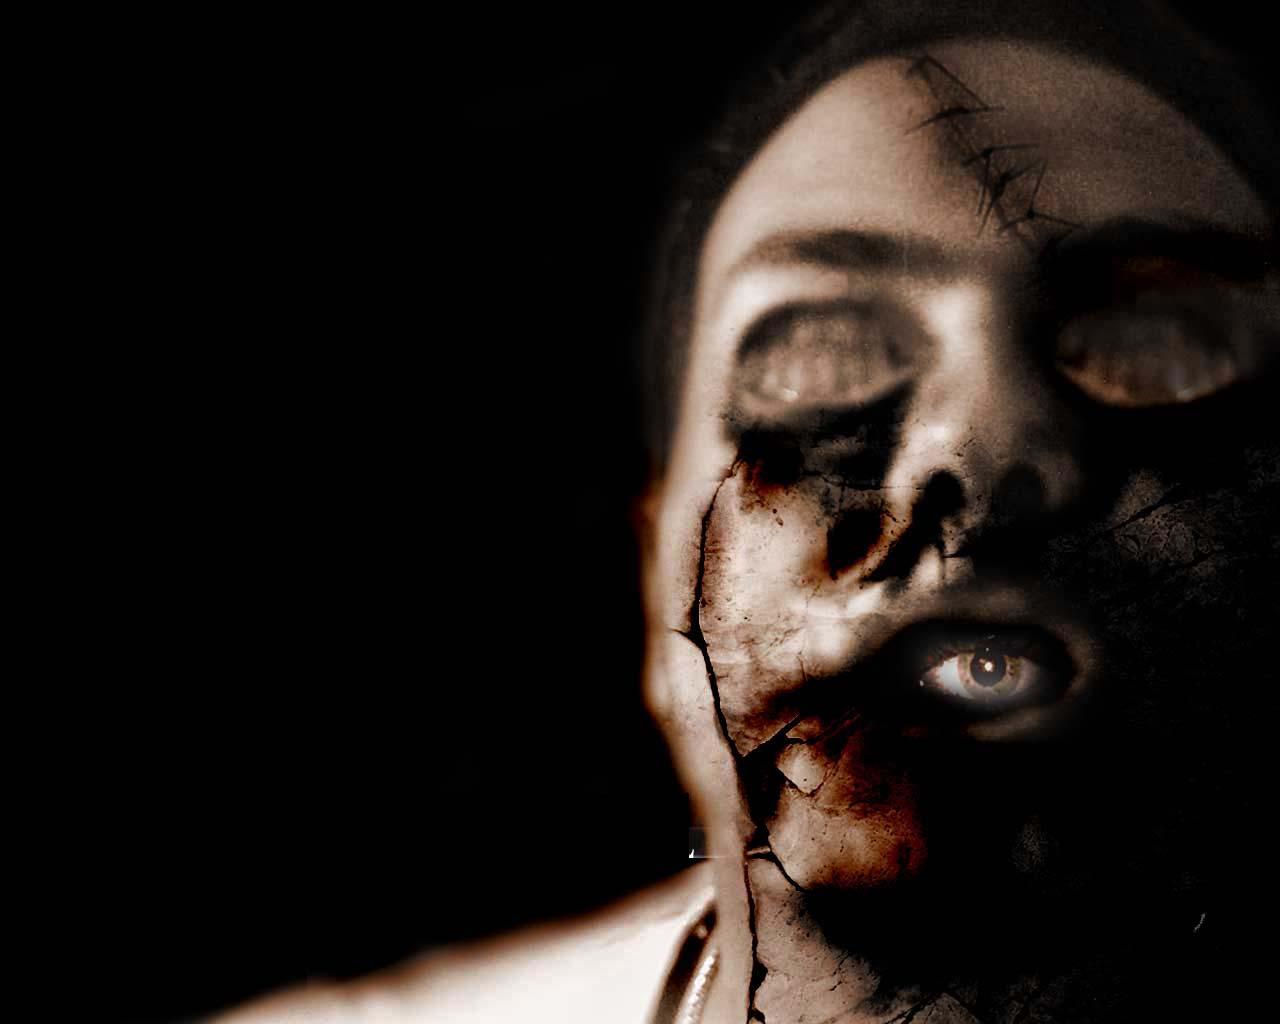 horror eye wallpaper hd - photo #32